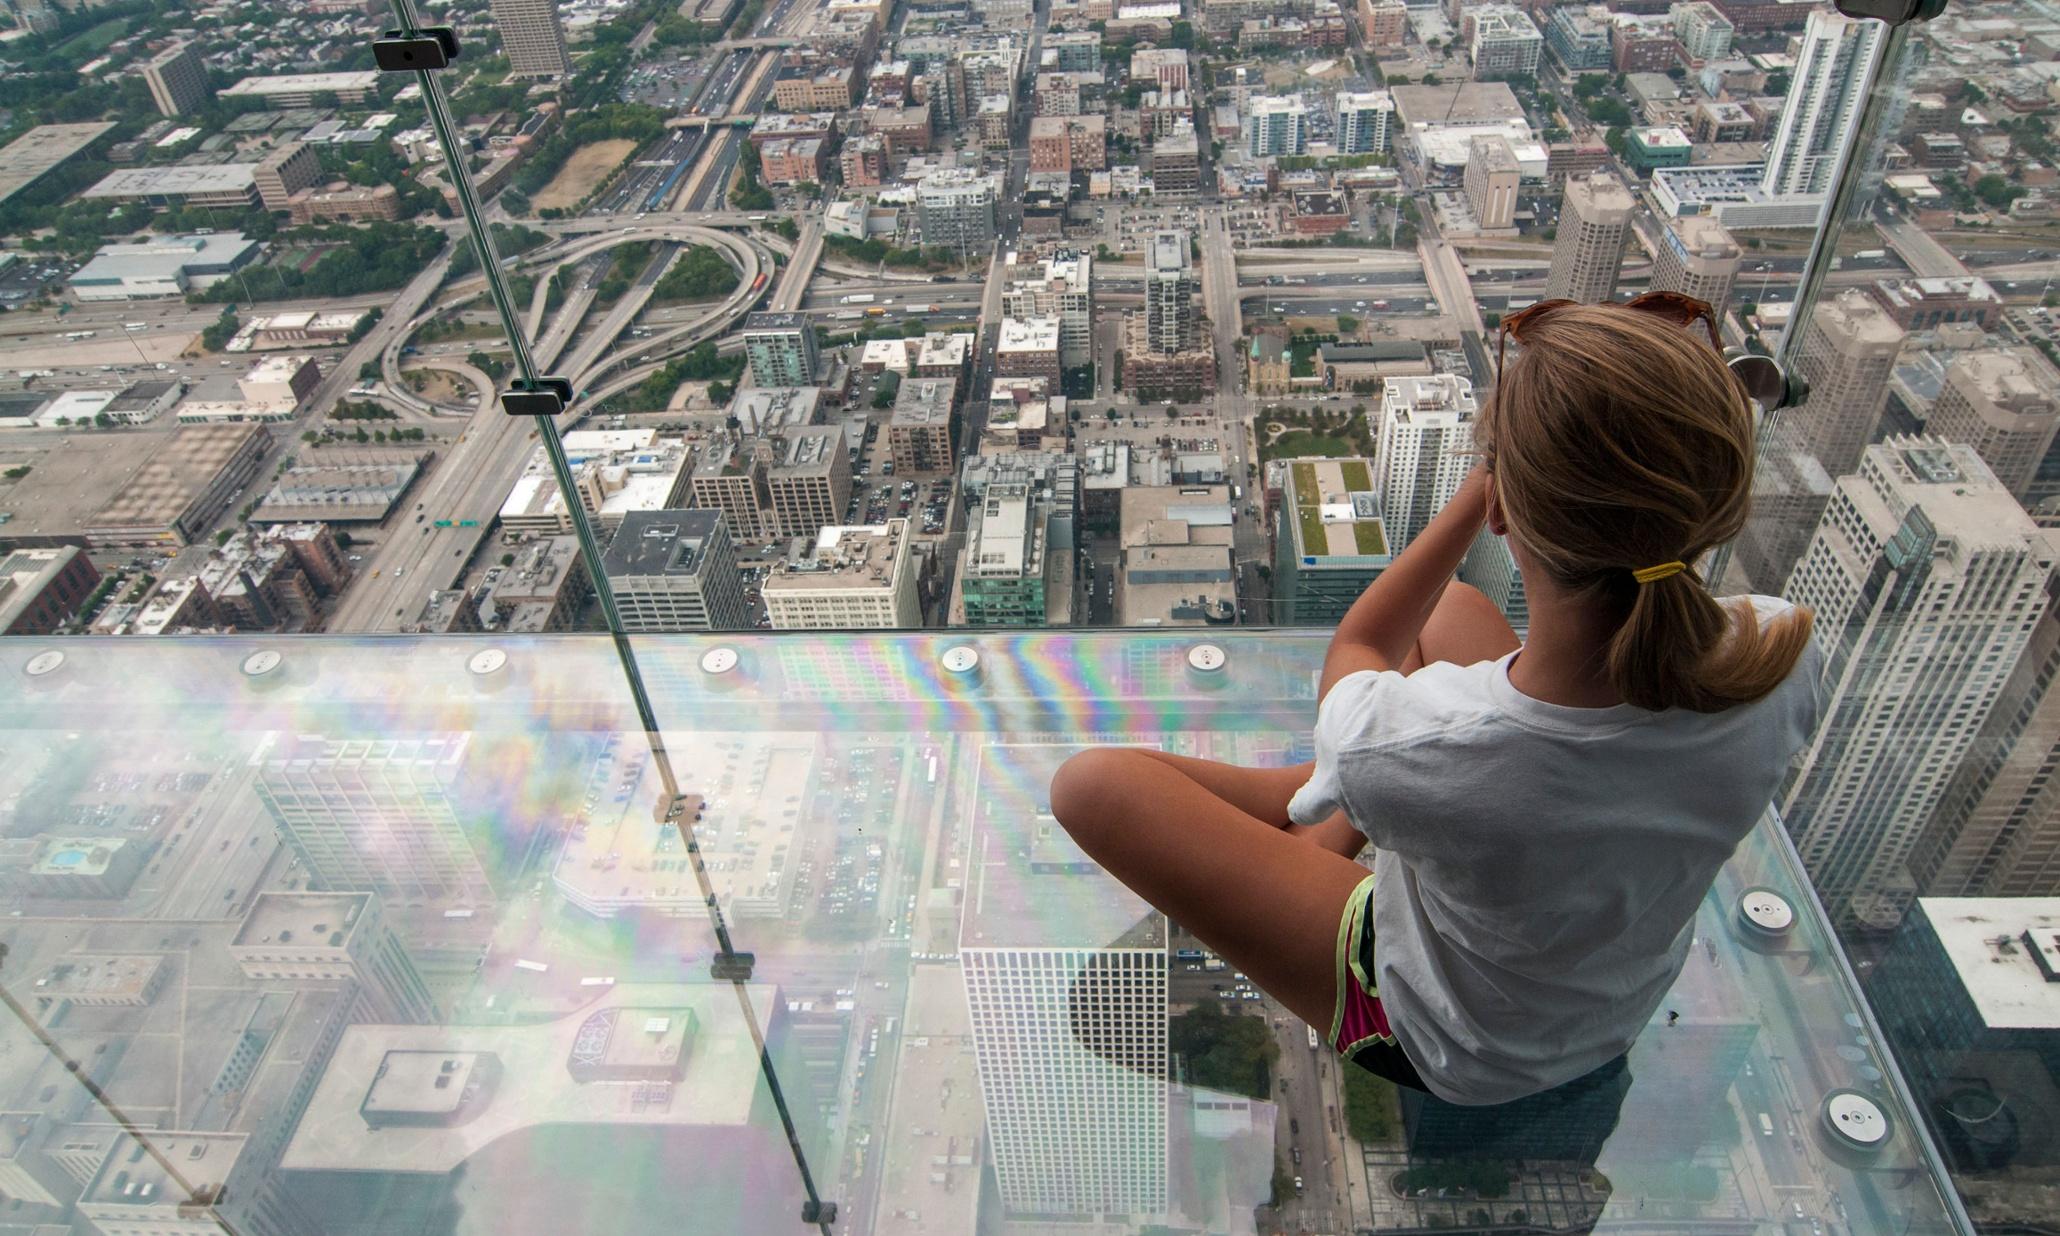 Chicago skyscraper 39 s viewing deck cracks under tourists for Glass deck floor